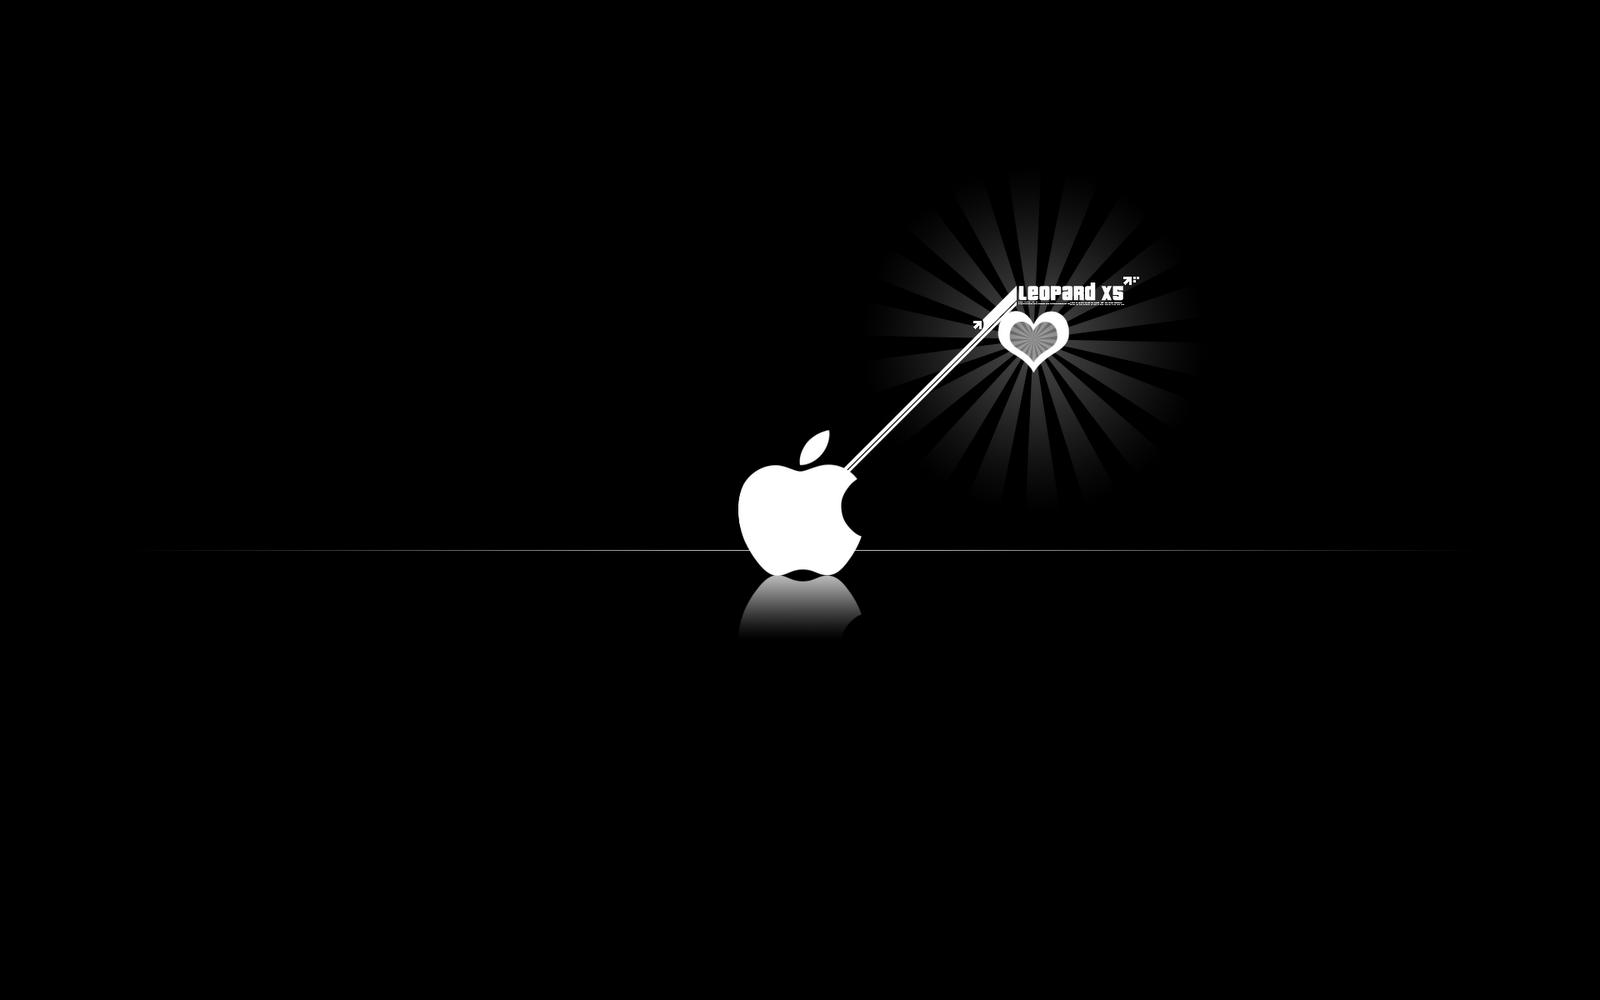 Sfondi hd mac leopard sfondi hd gratis for Sfondo apple hd